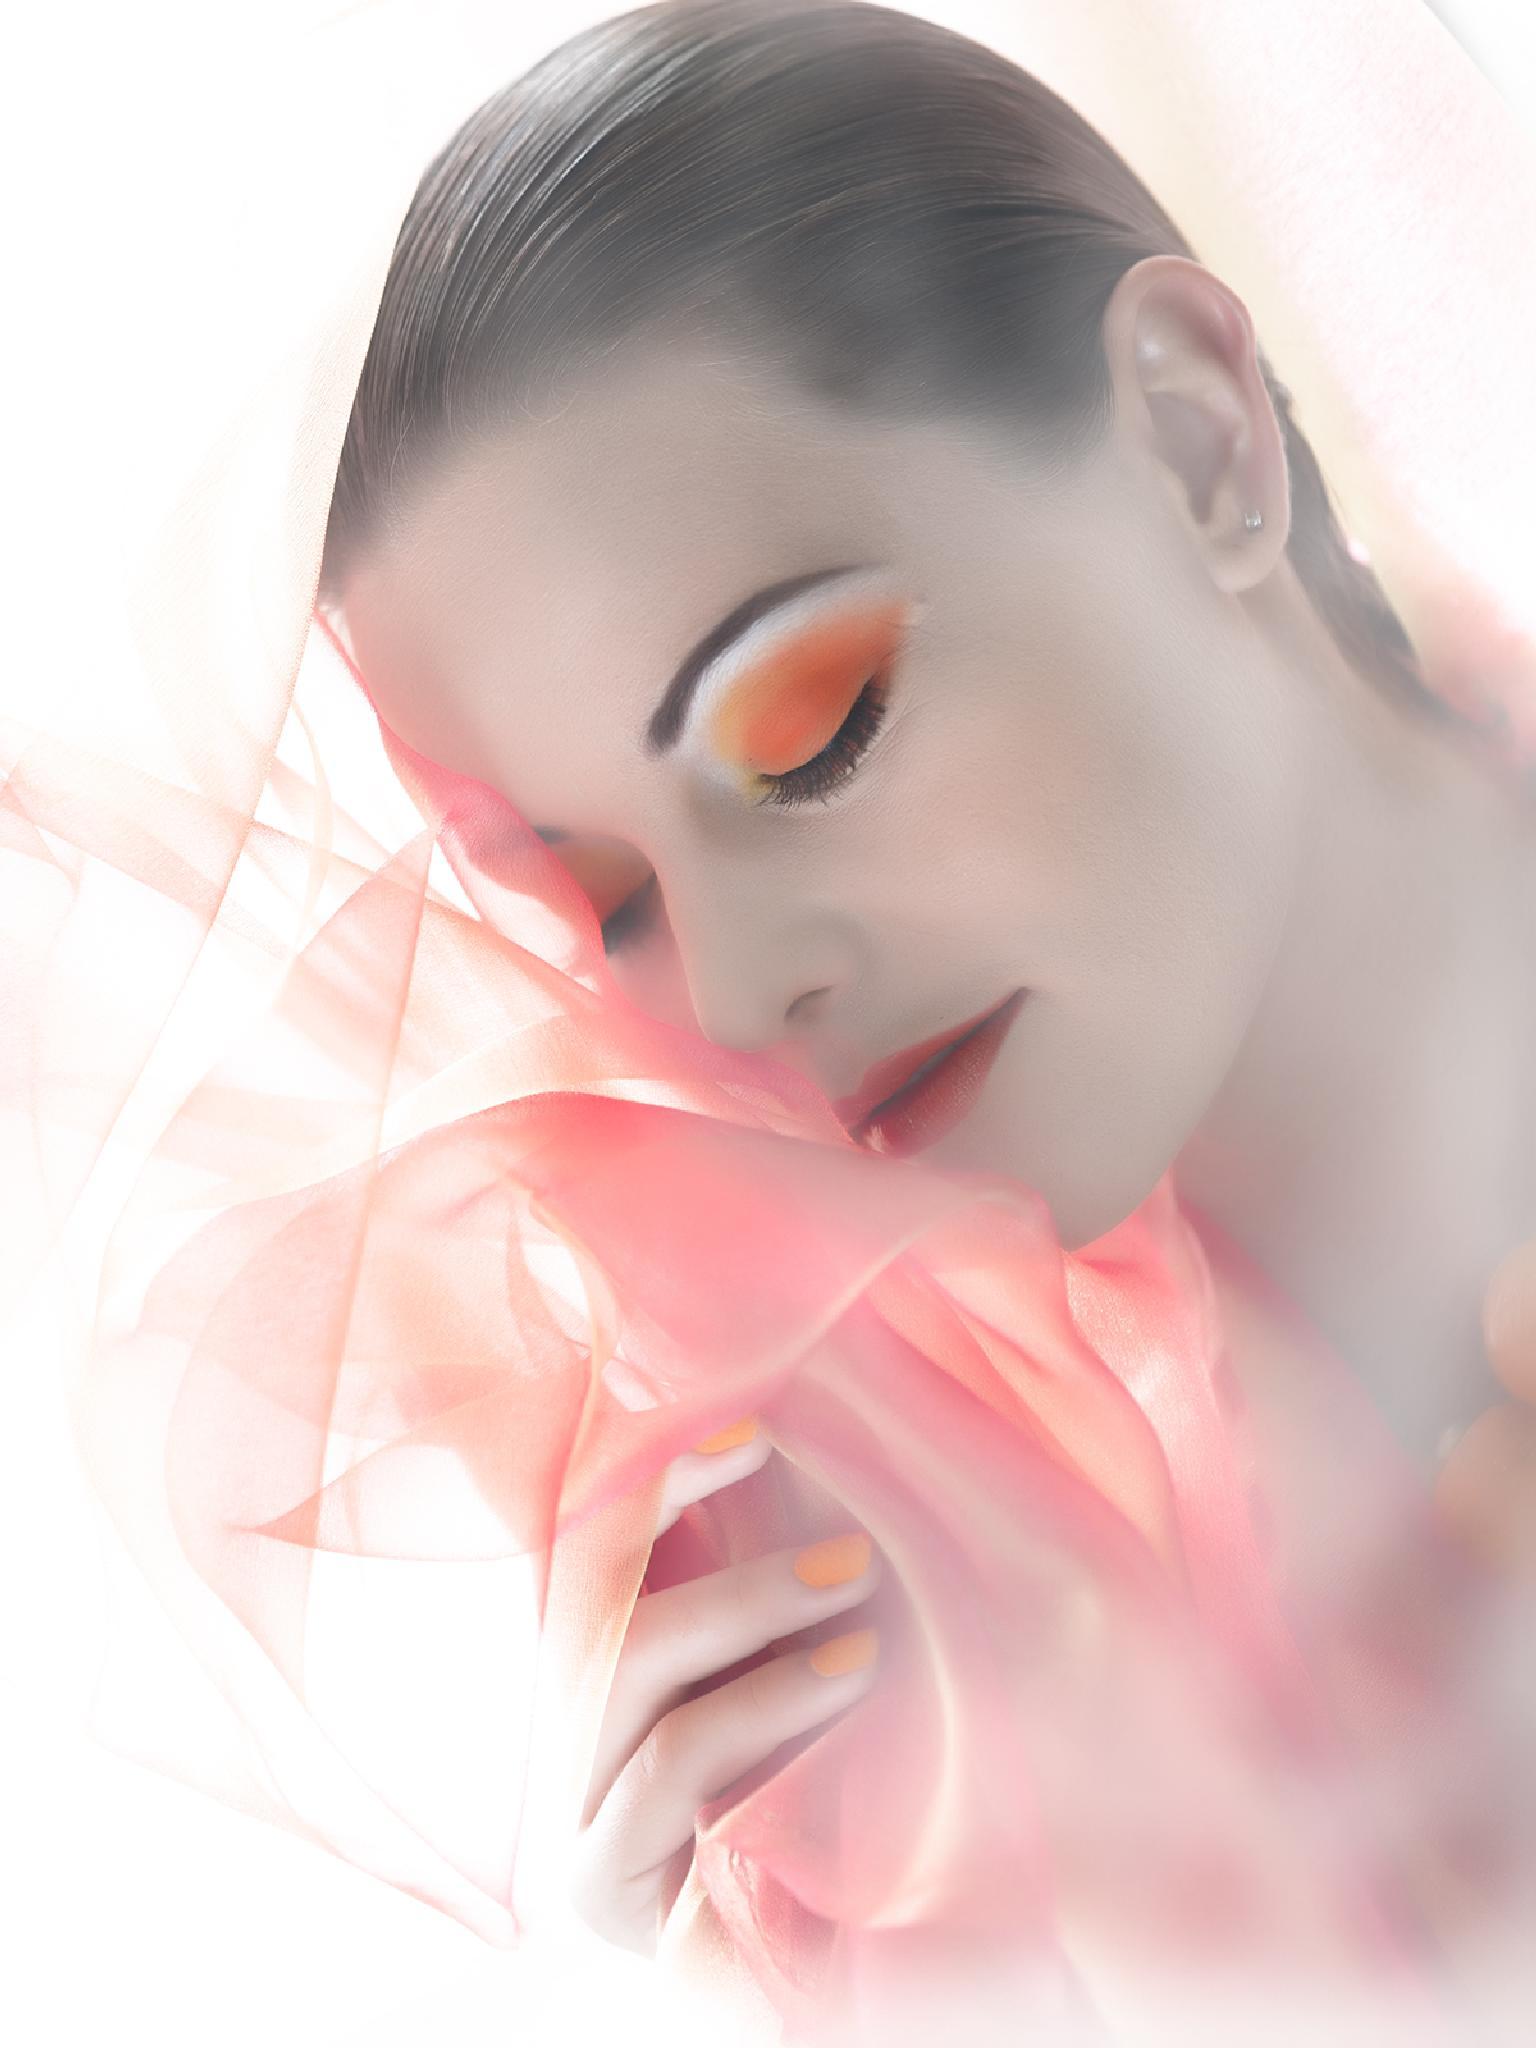 Her Dreams by juliustsantos